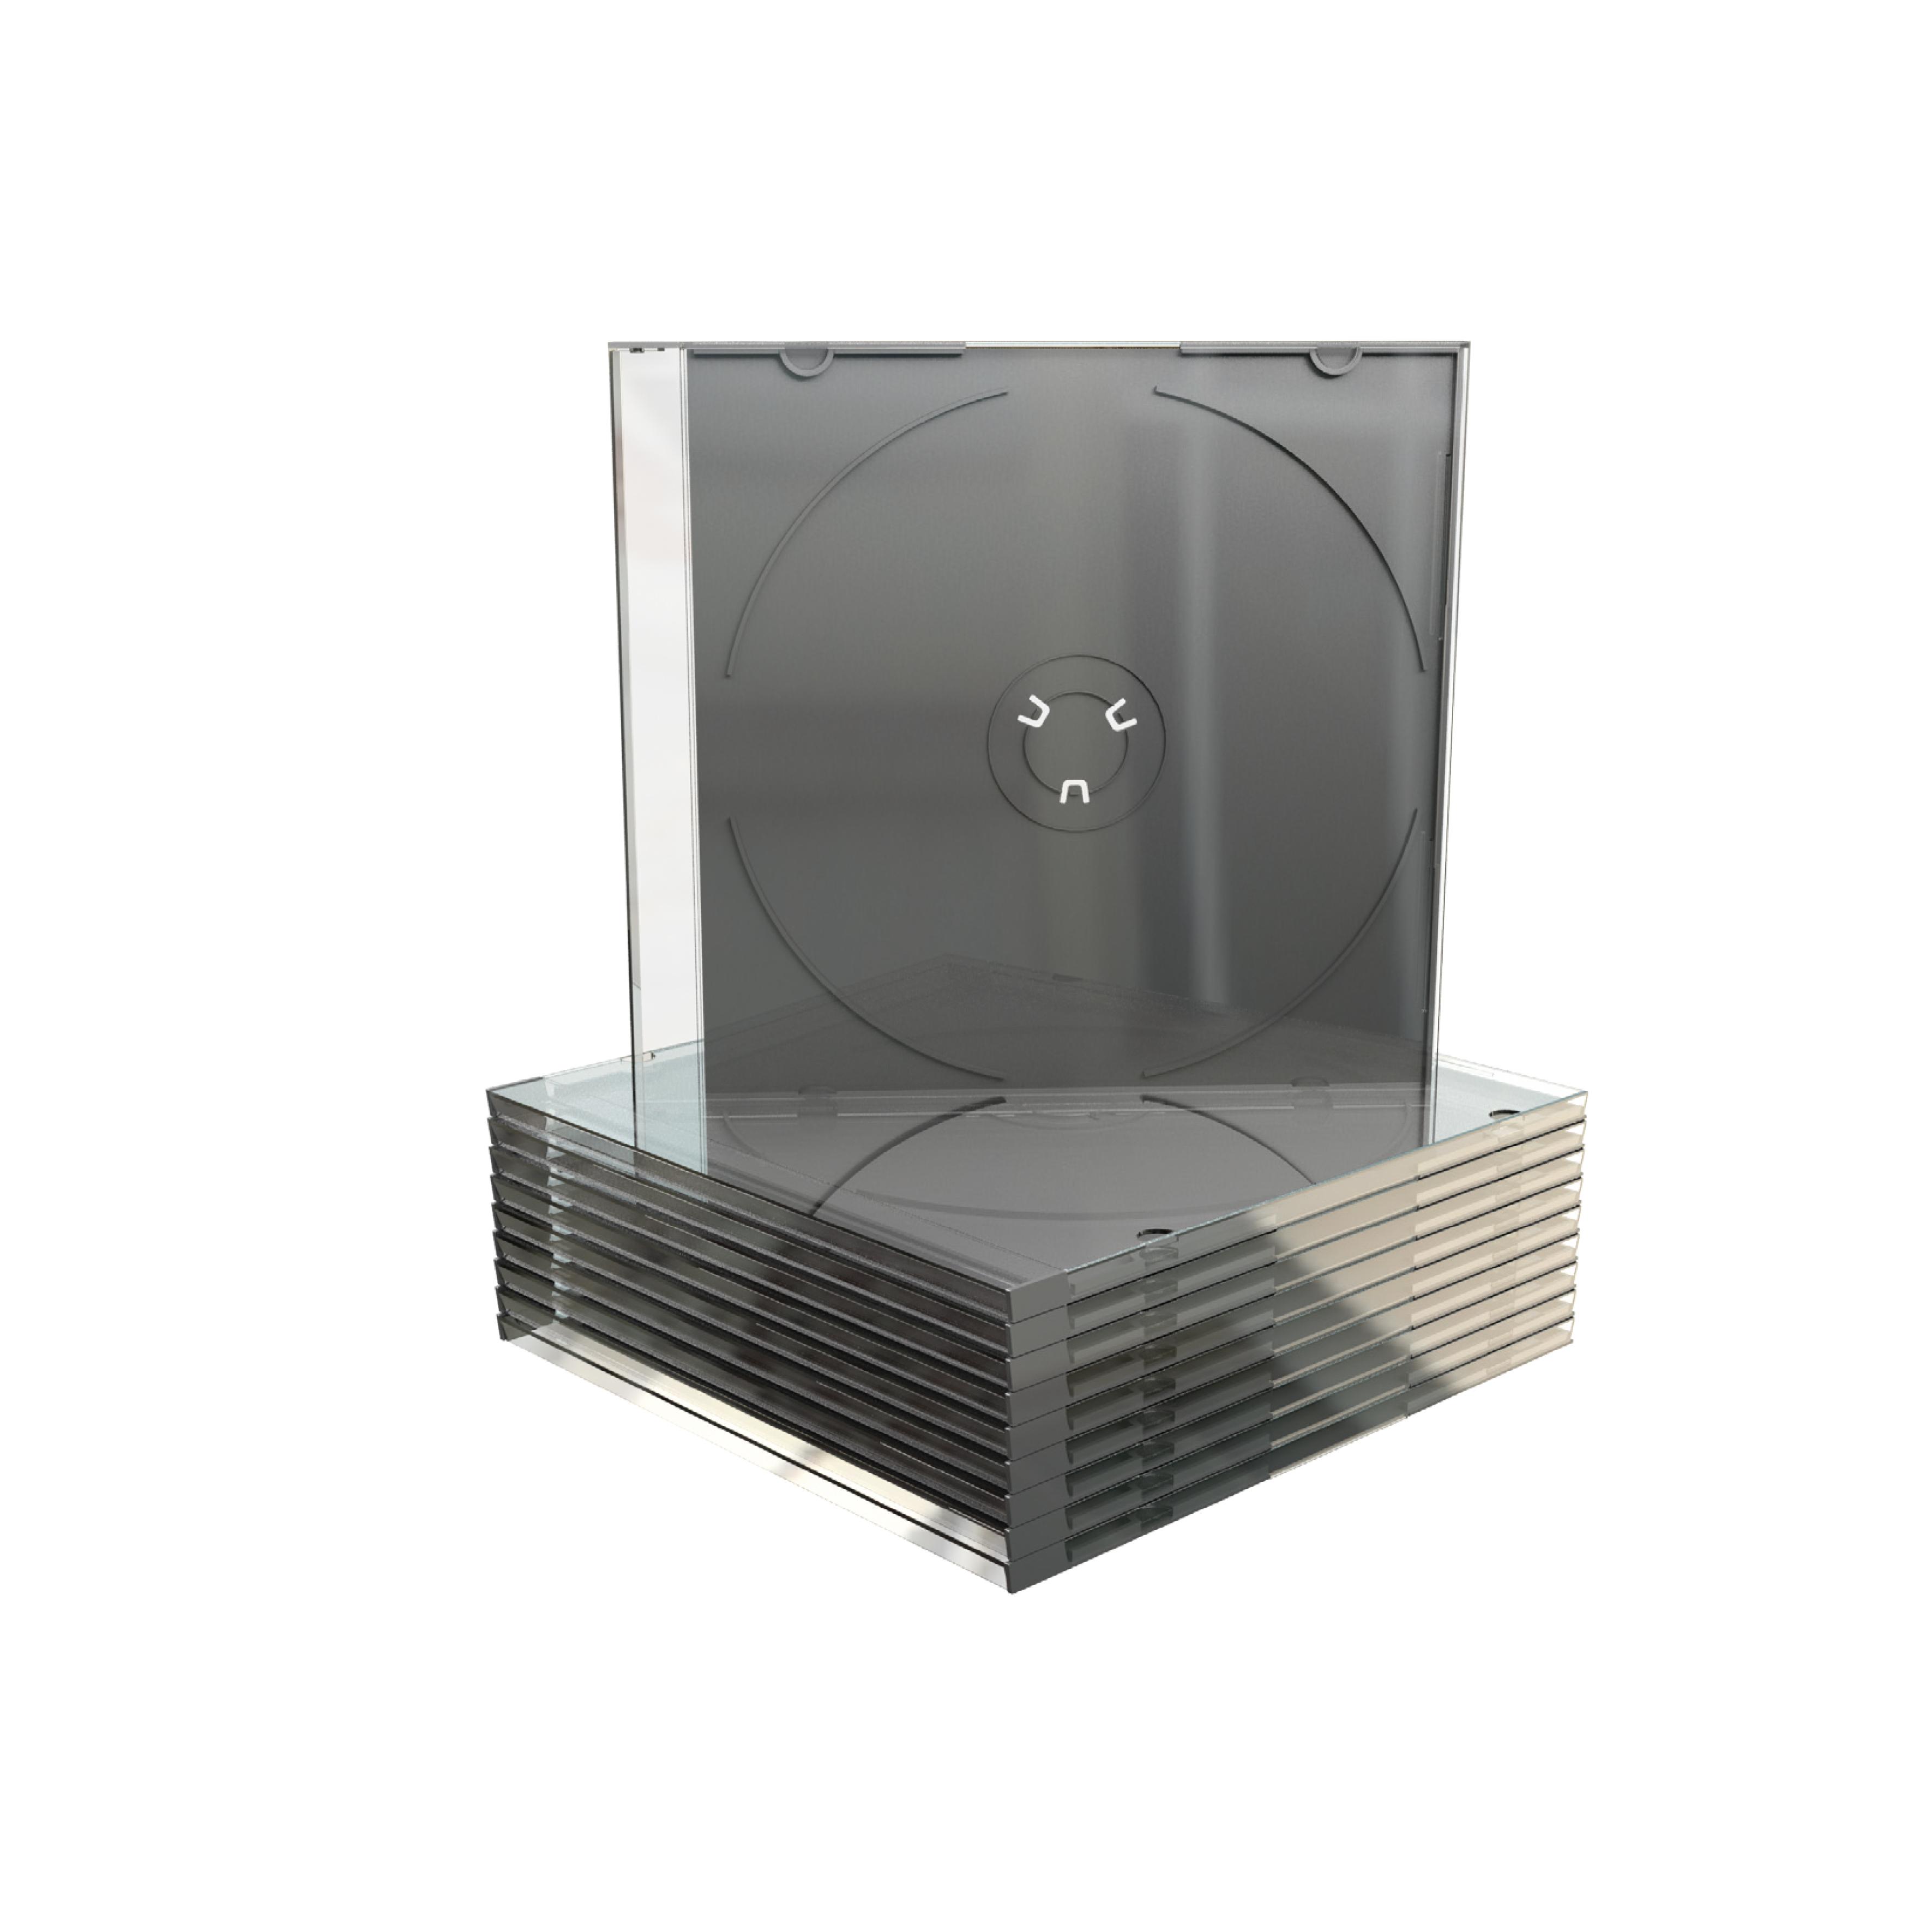 MEDIARANGE BOX21-M - Schmuckschatulle - 1 Disks - Schwarz - Transparent - Kunststoff - 120 mm - 140 mm